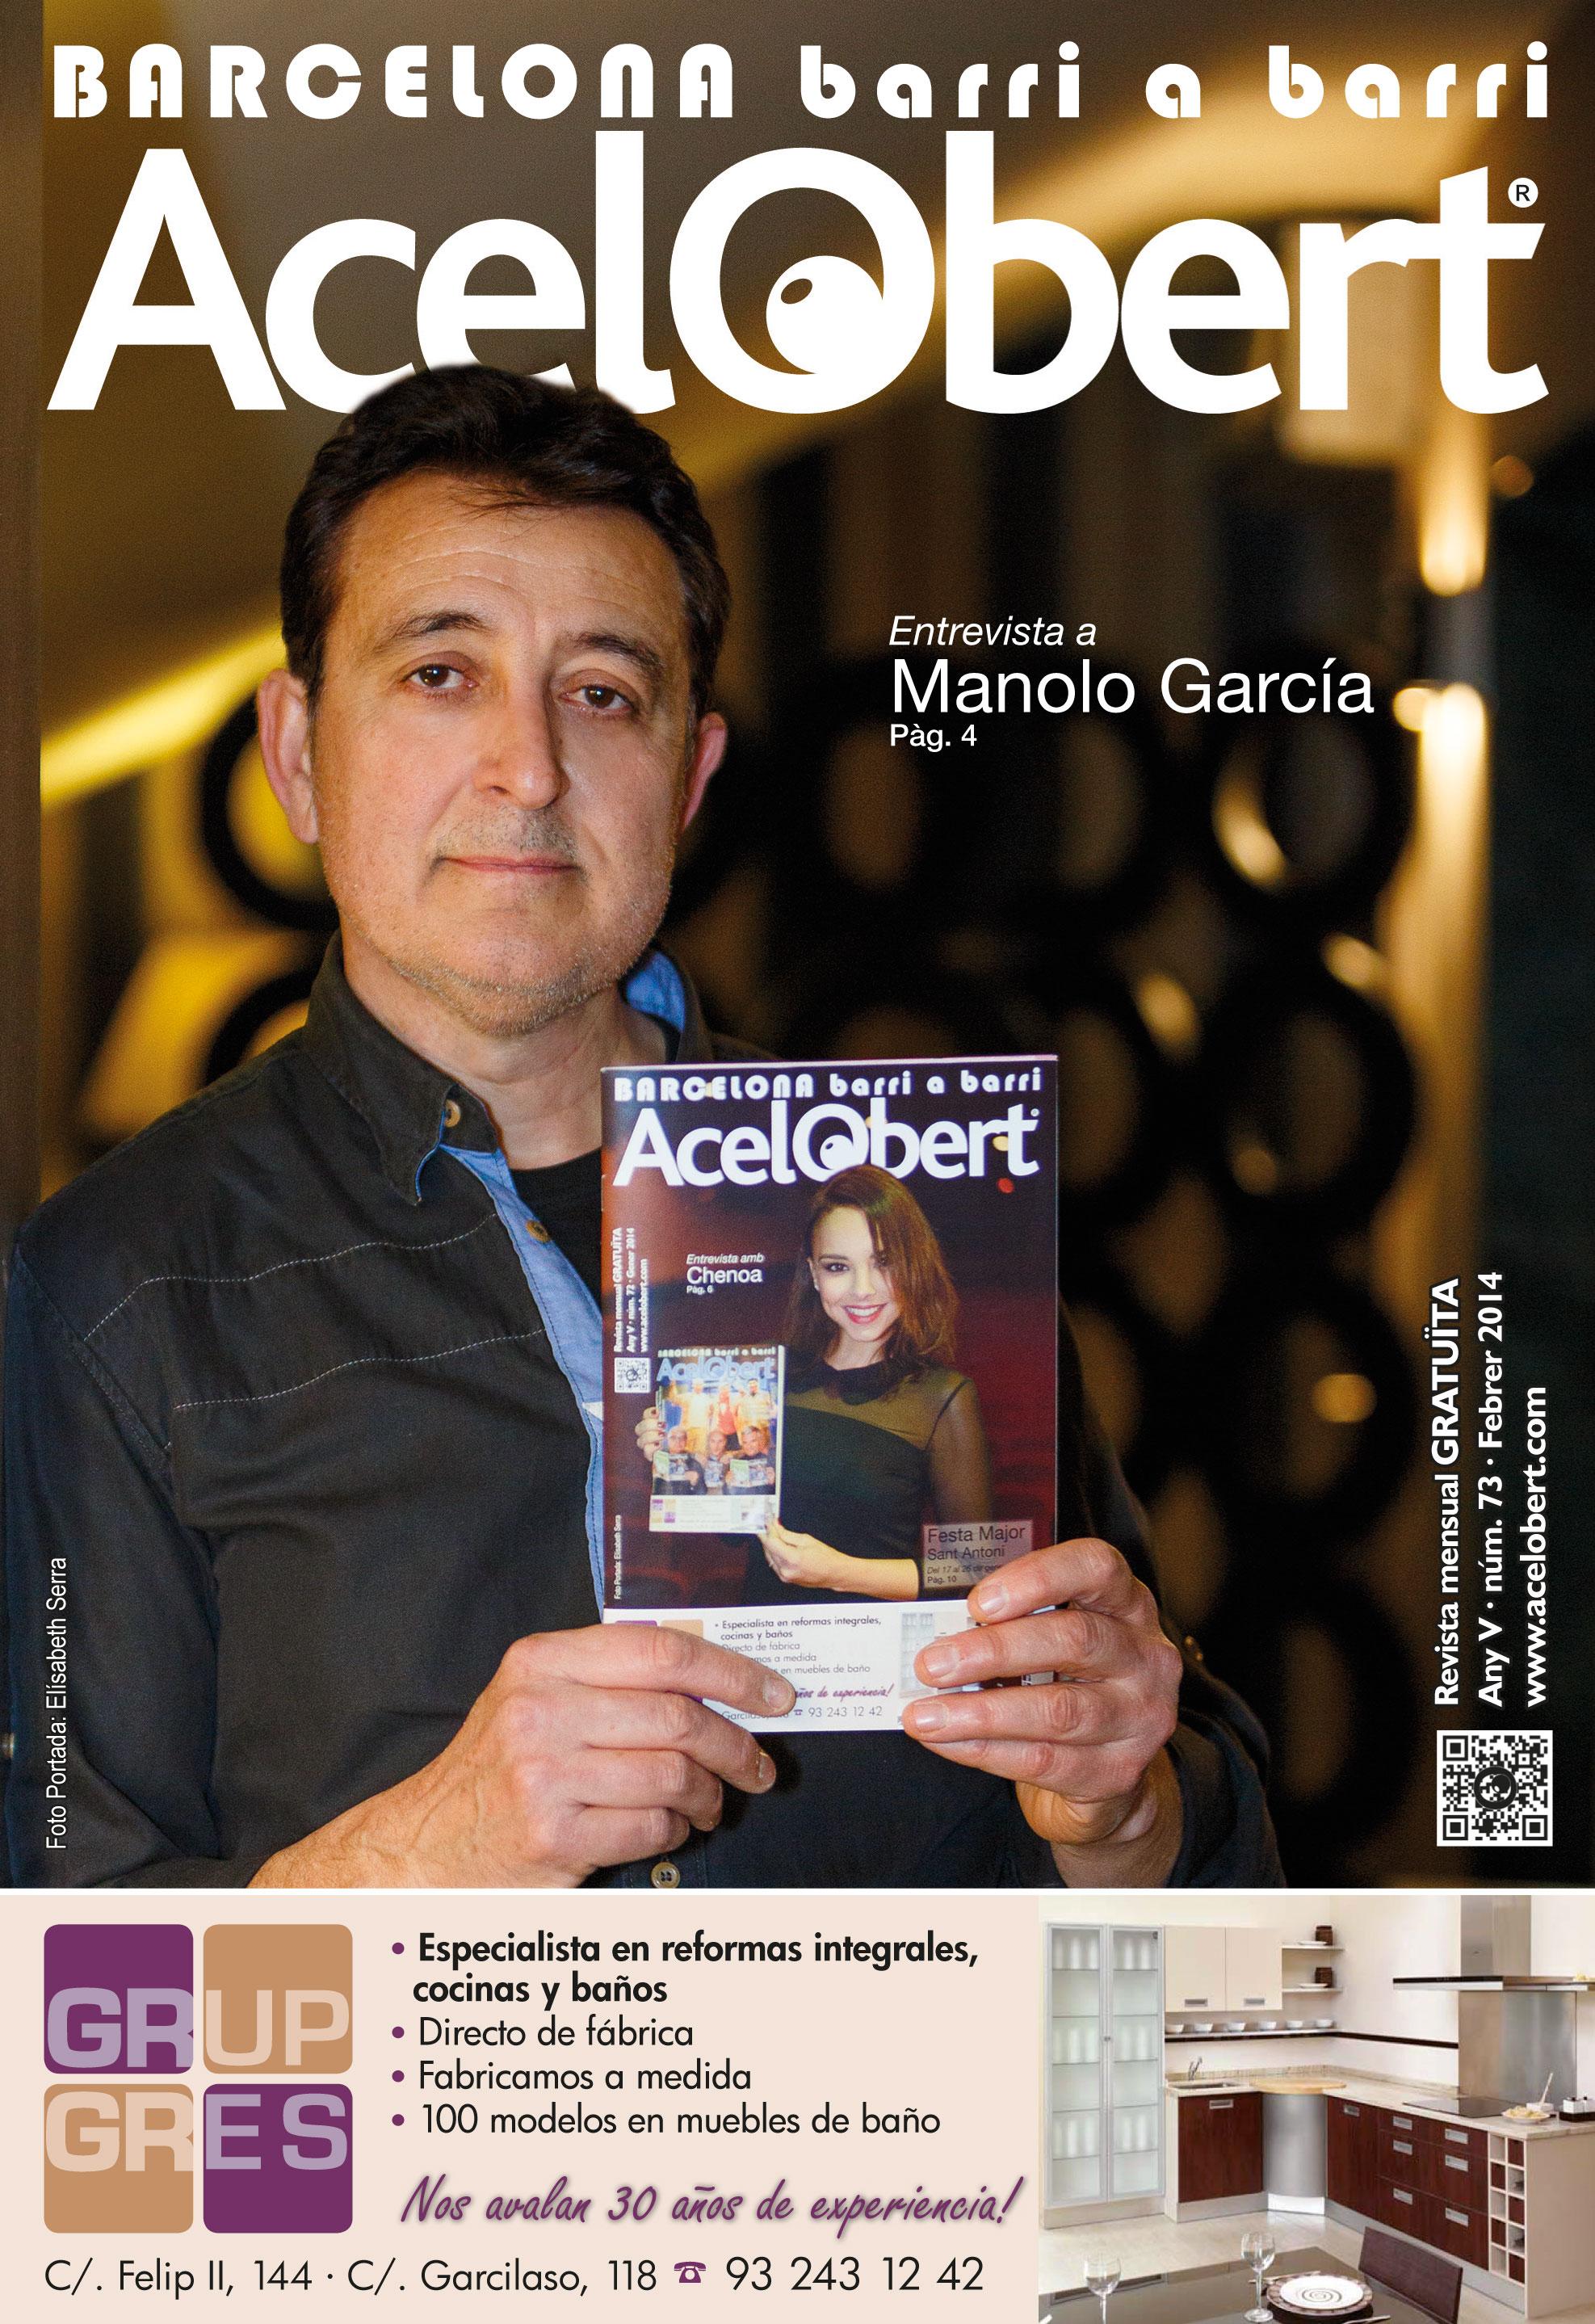 Acelobert Barcelona nº73 Febrer 2014